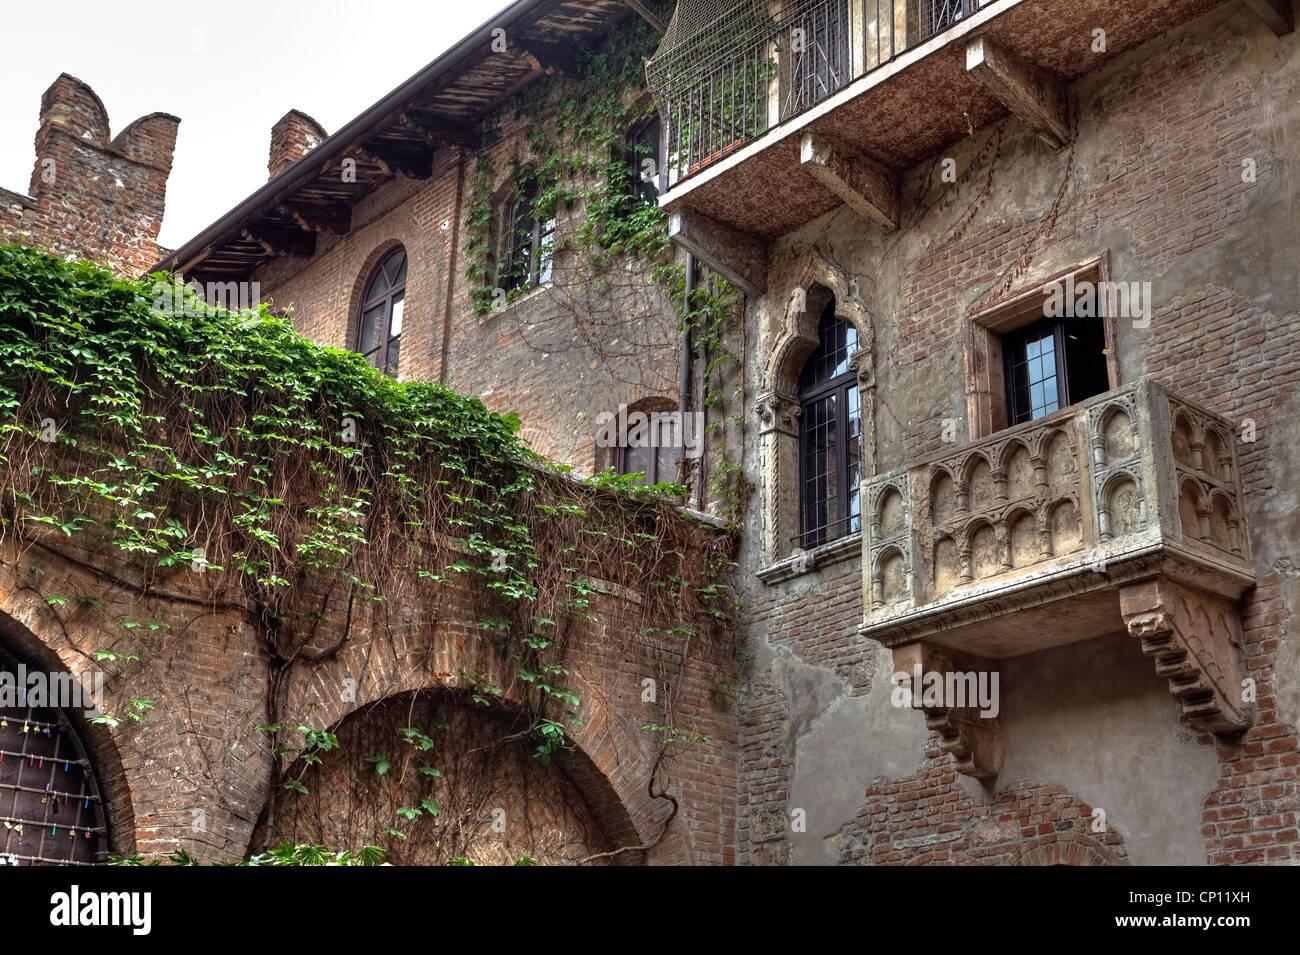 Balkon von Julia, Verona, Veneto, Italien Stockbild